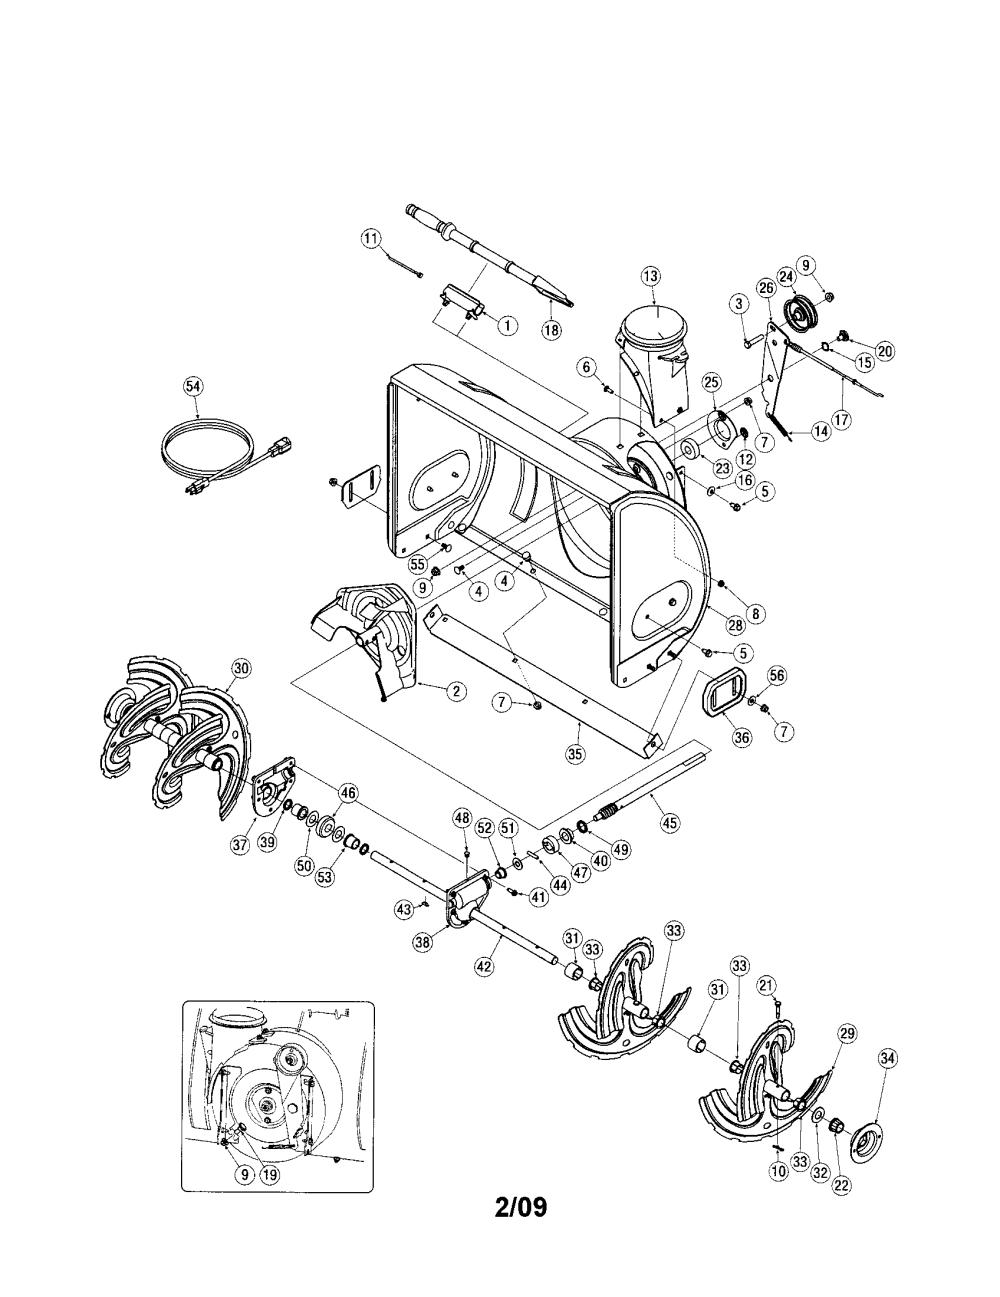 medium resolution of mtd snowblower wiring diagram schema wiring diagram mtd snowblower fuel system diagram